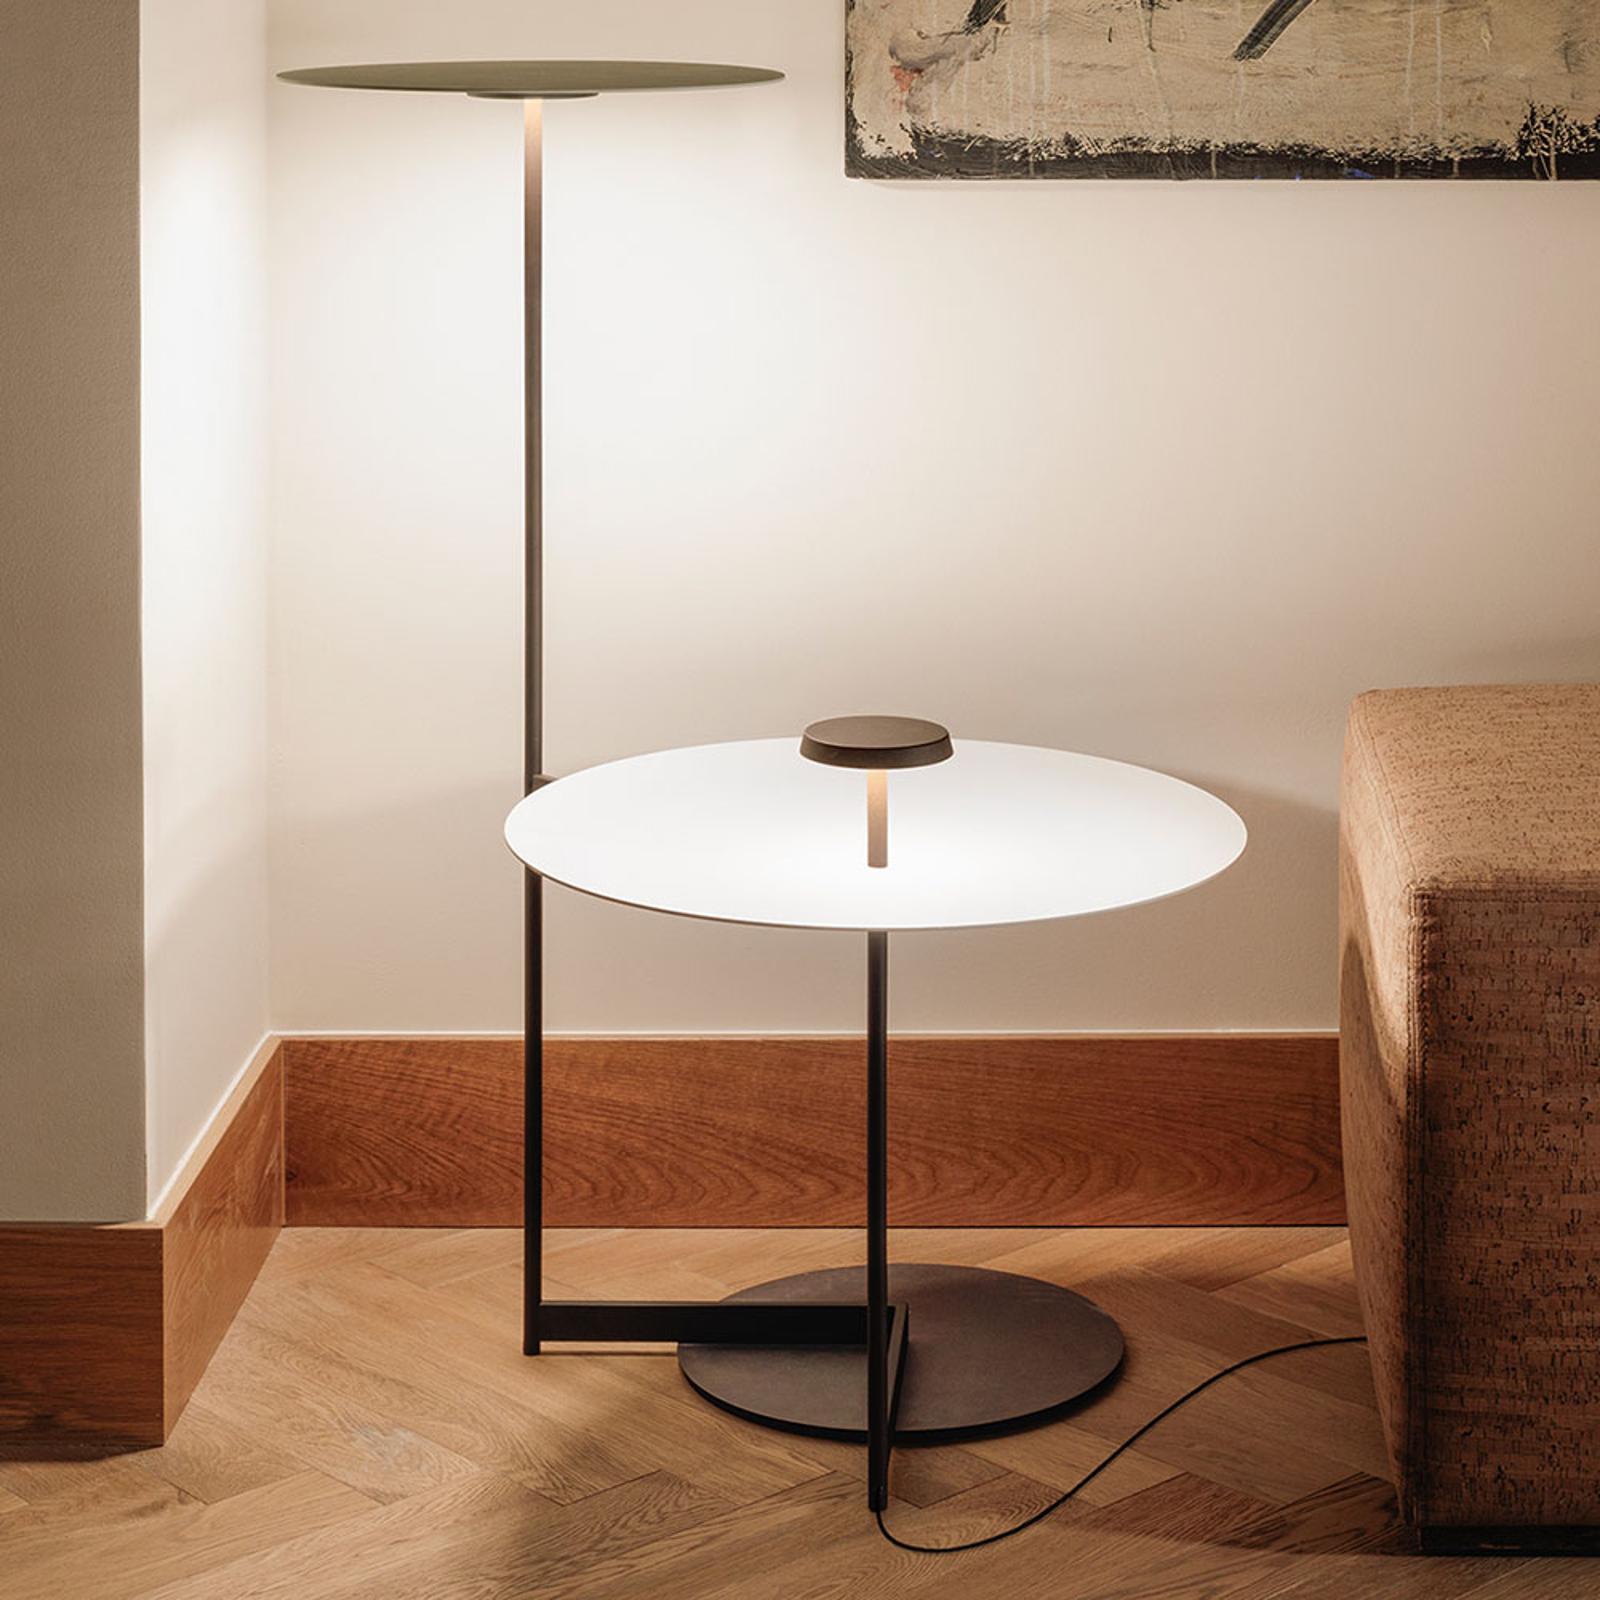 Vibia Flat LED Stehlampe 221 cm grau L21, dimmbar